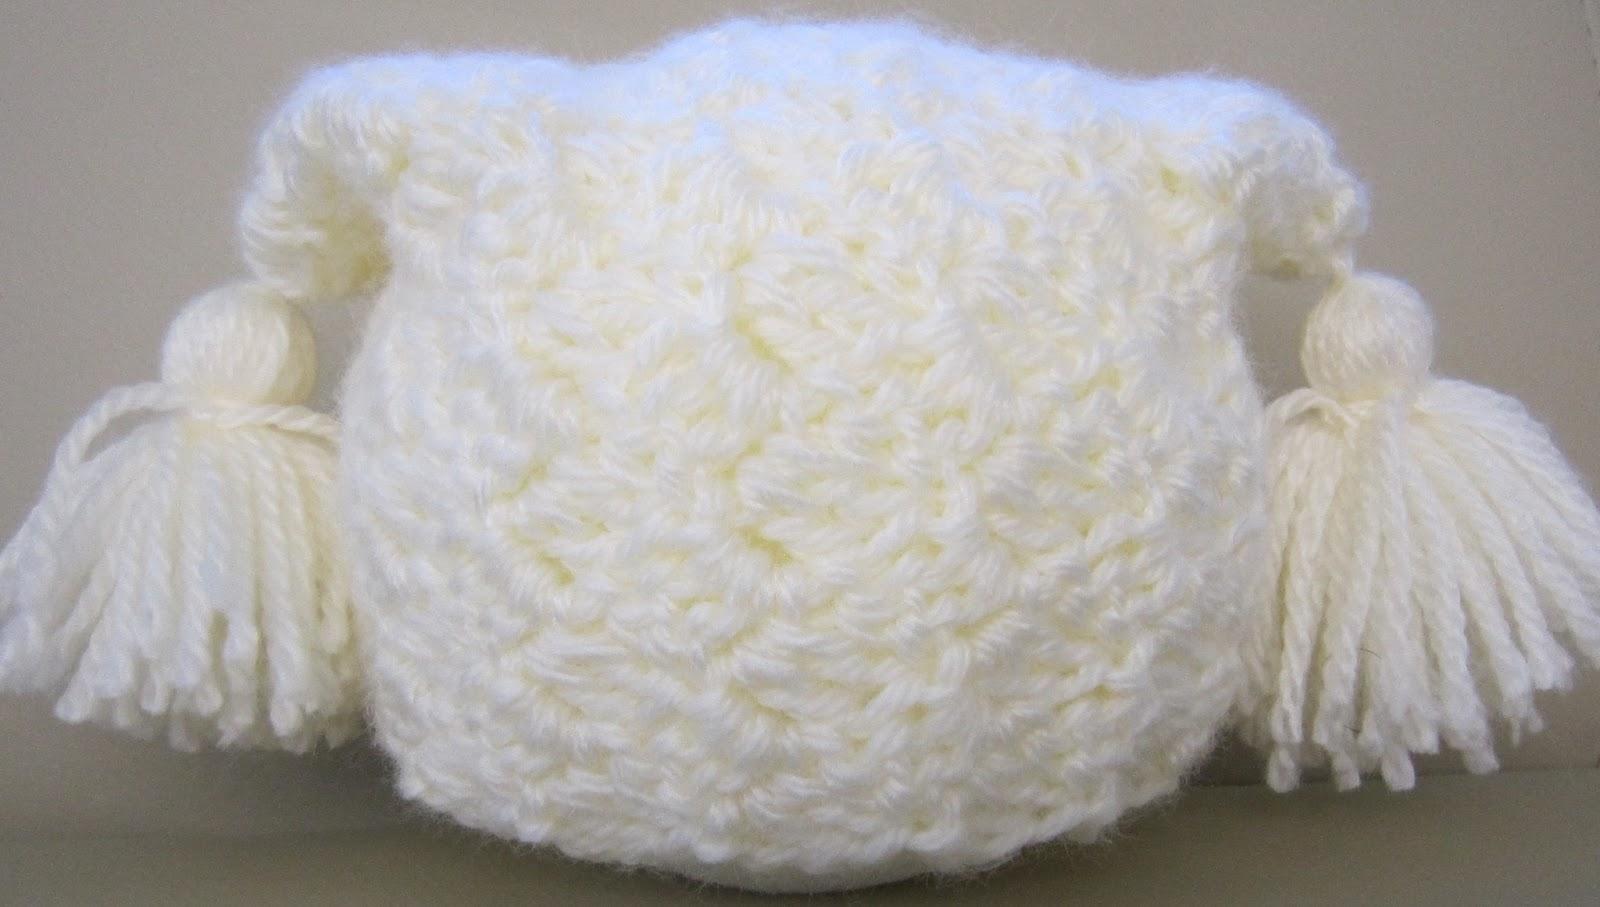 Free Crochet Pattern Preemie Blanket : Sea Trail Grandmas: FREE CROCHET PREEMIE AND NEWBORN ...